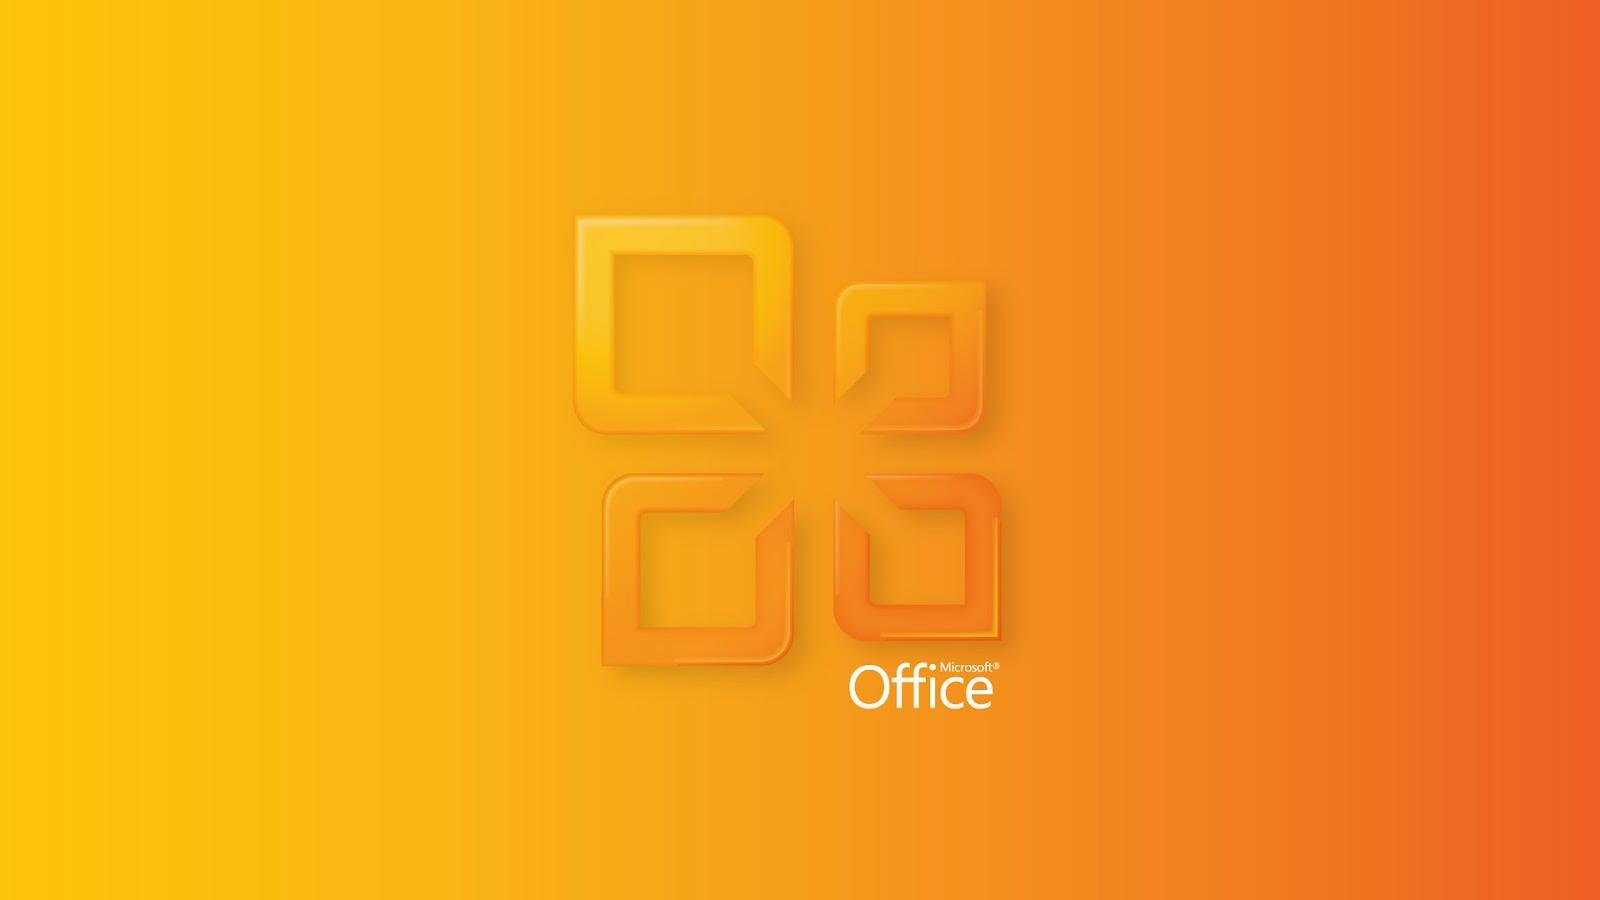 Microsoft Office Wallpaper 05